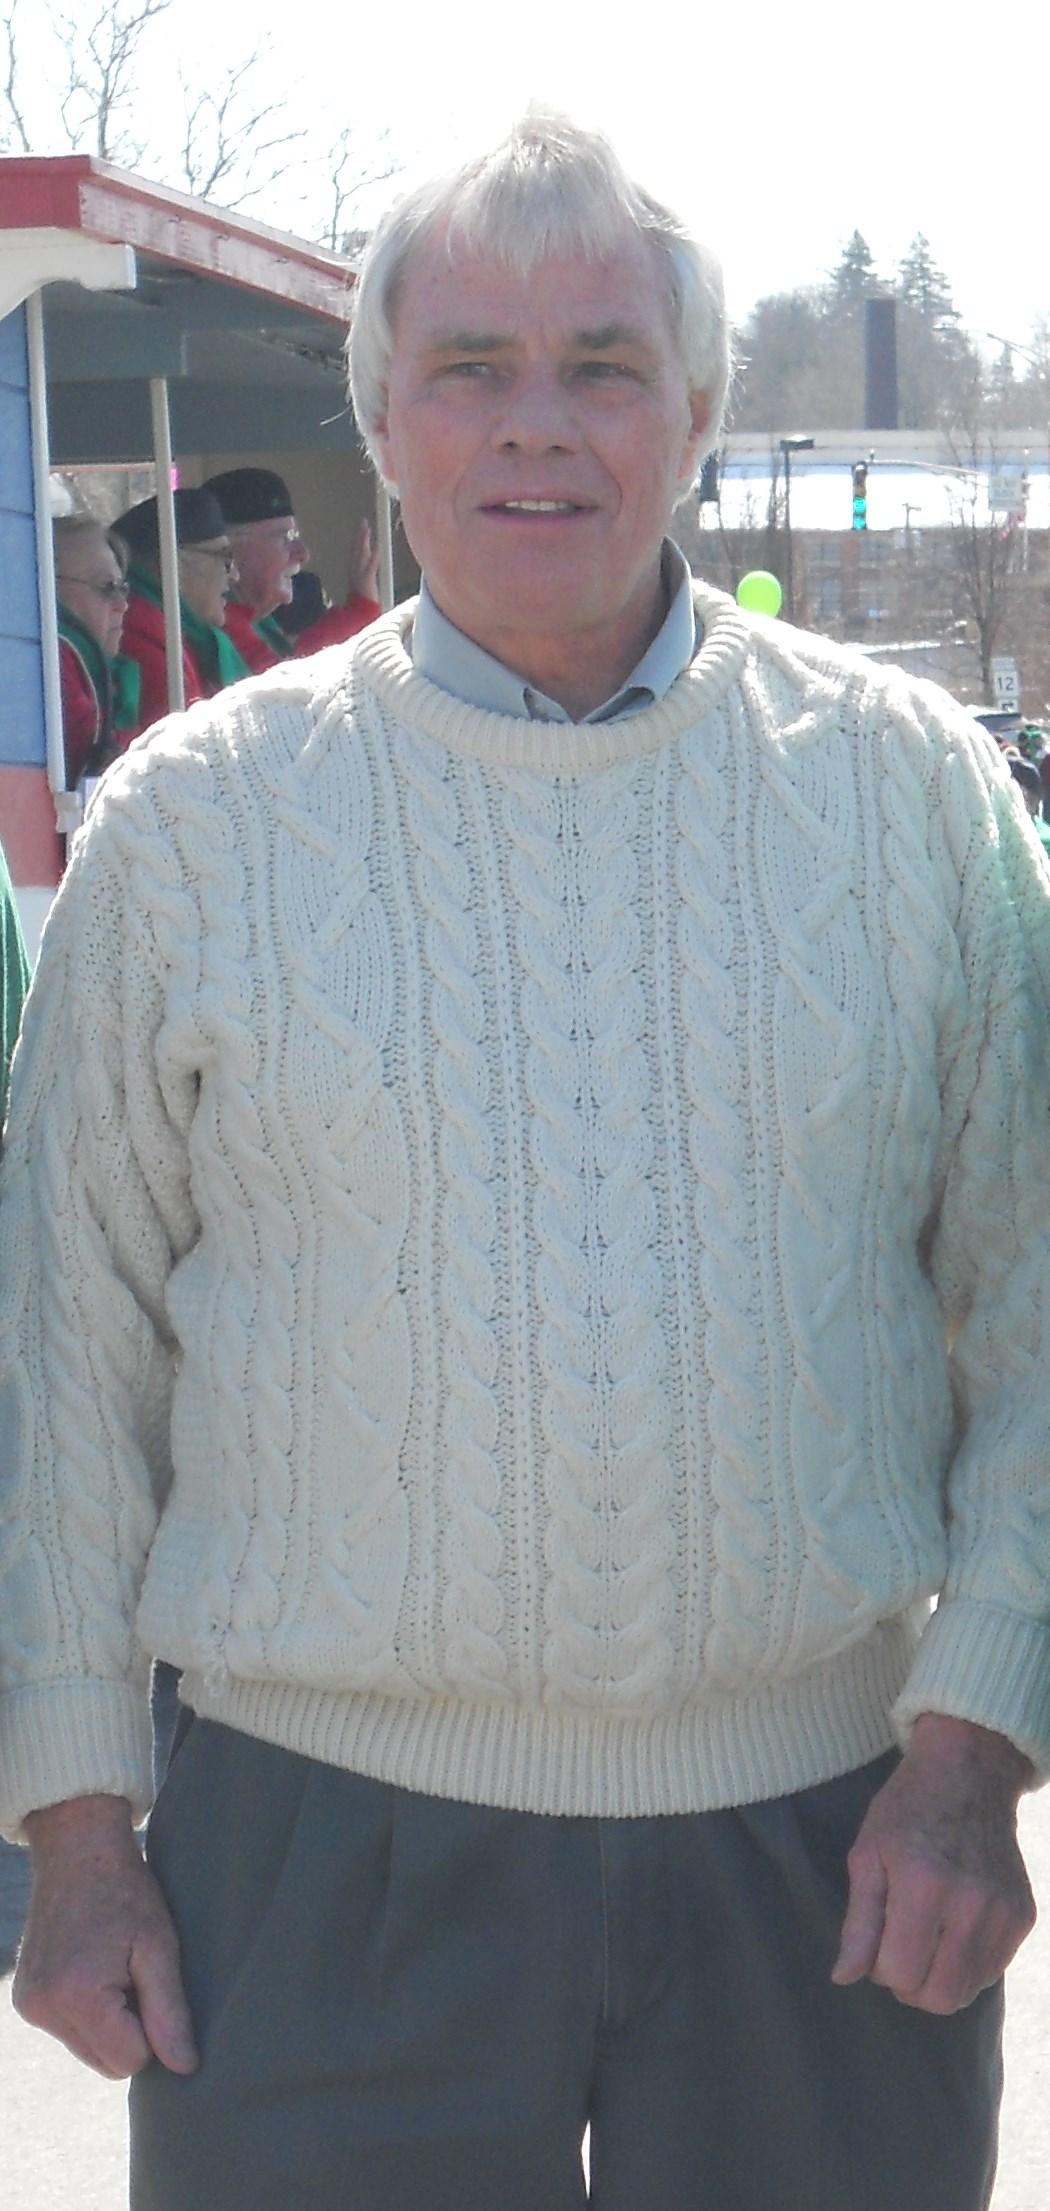 Gordon P. Hargrove